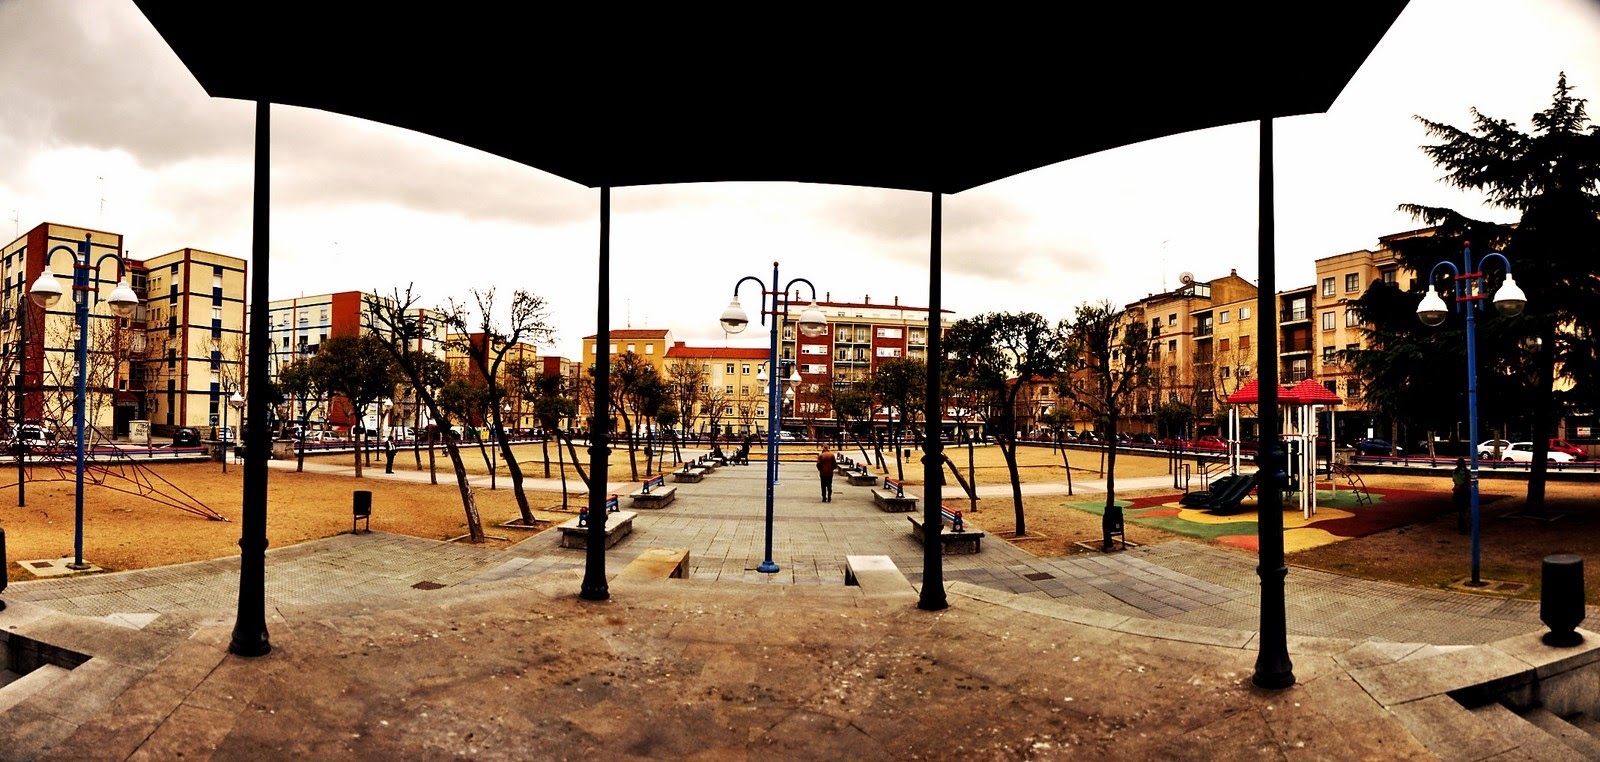 Parque de Garrido, salamanca, bici